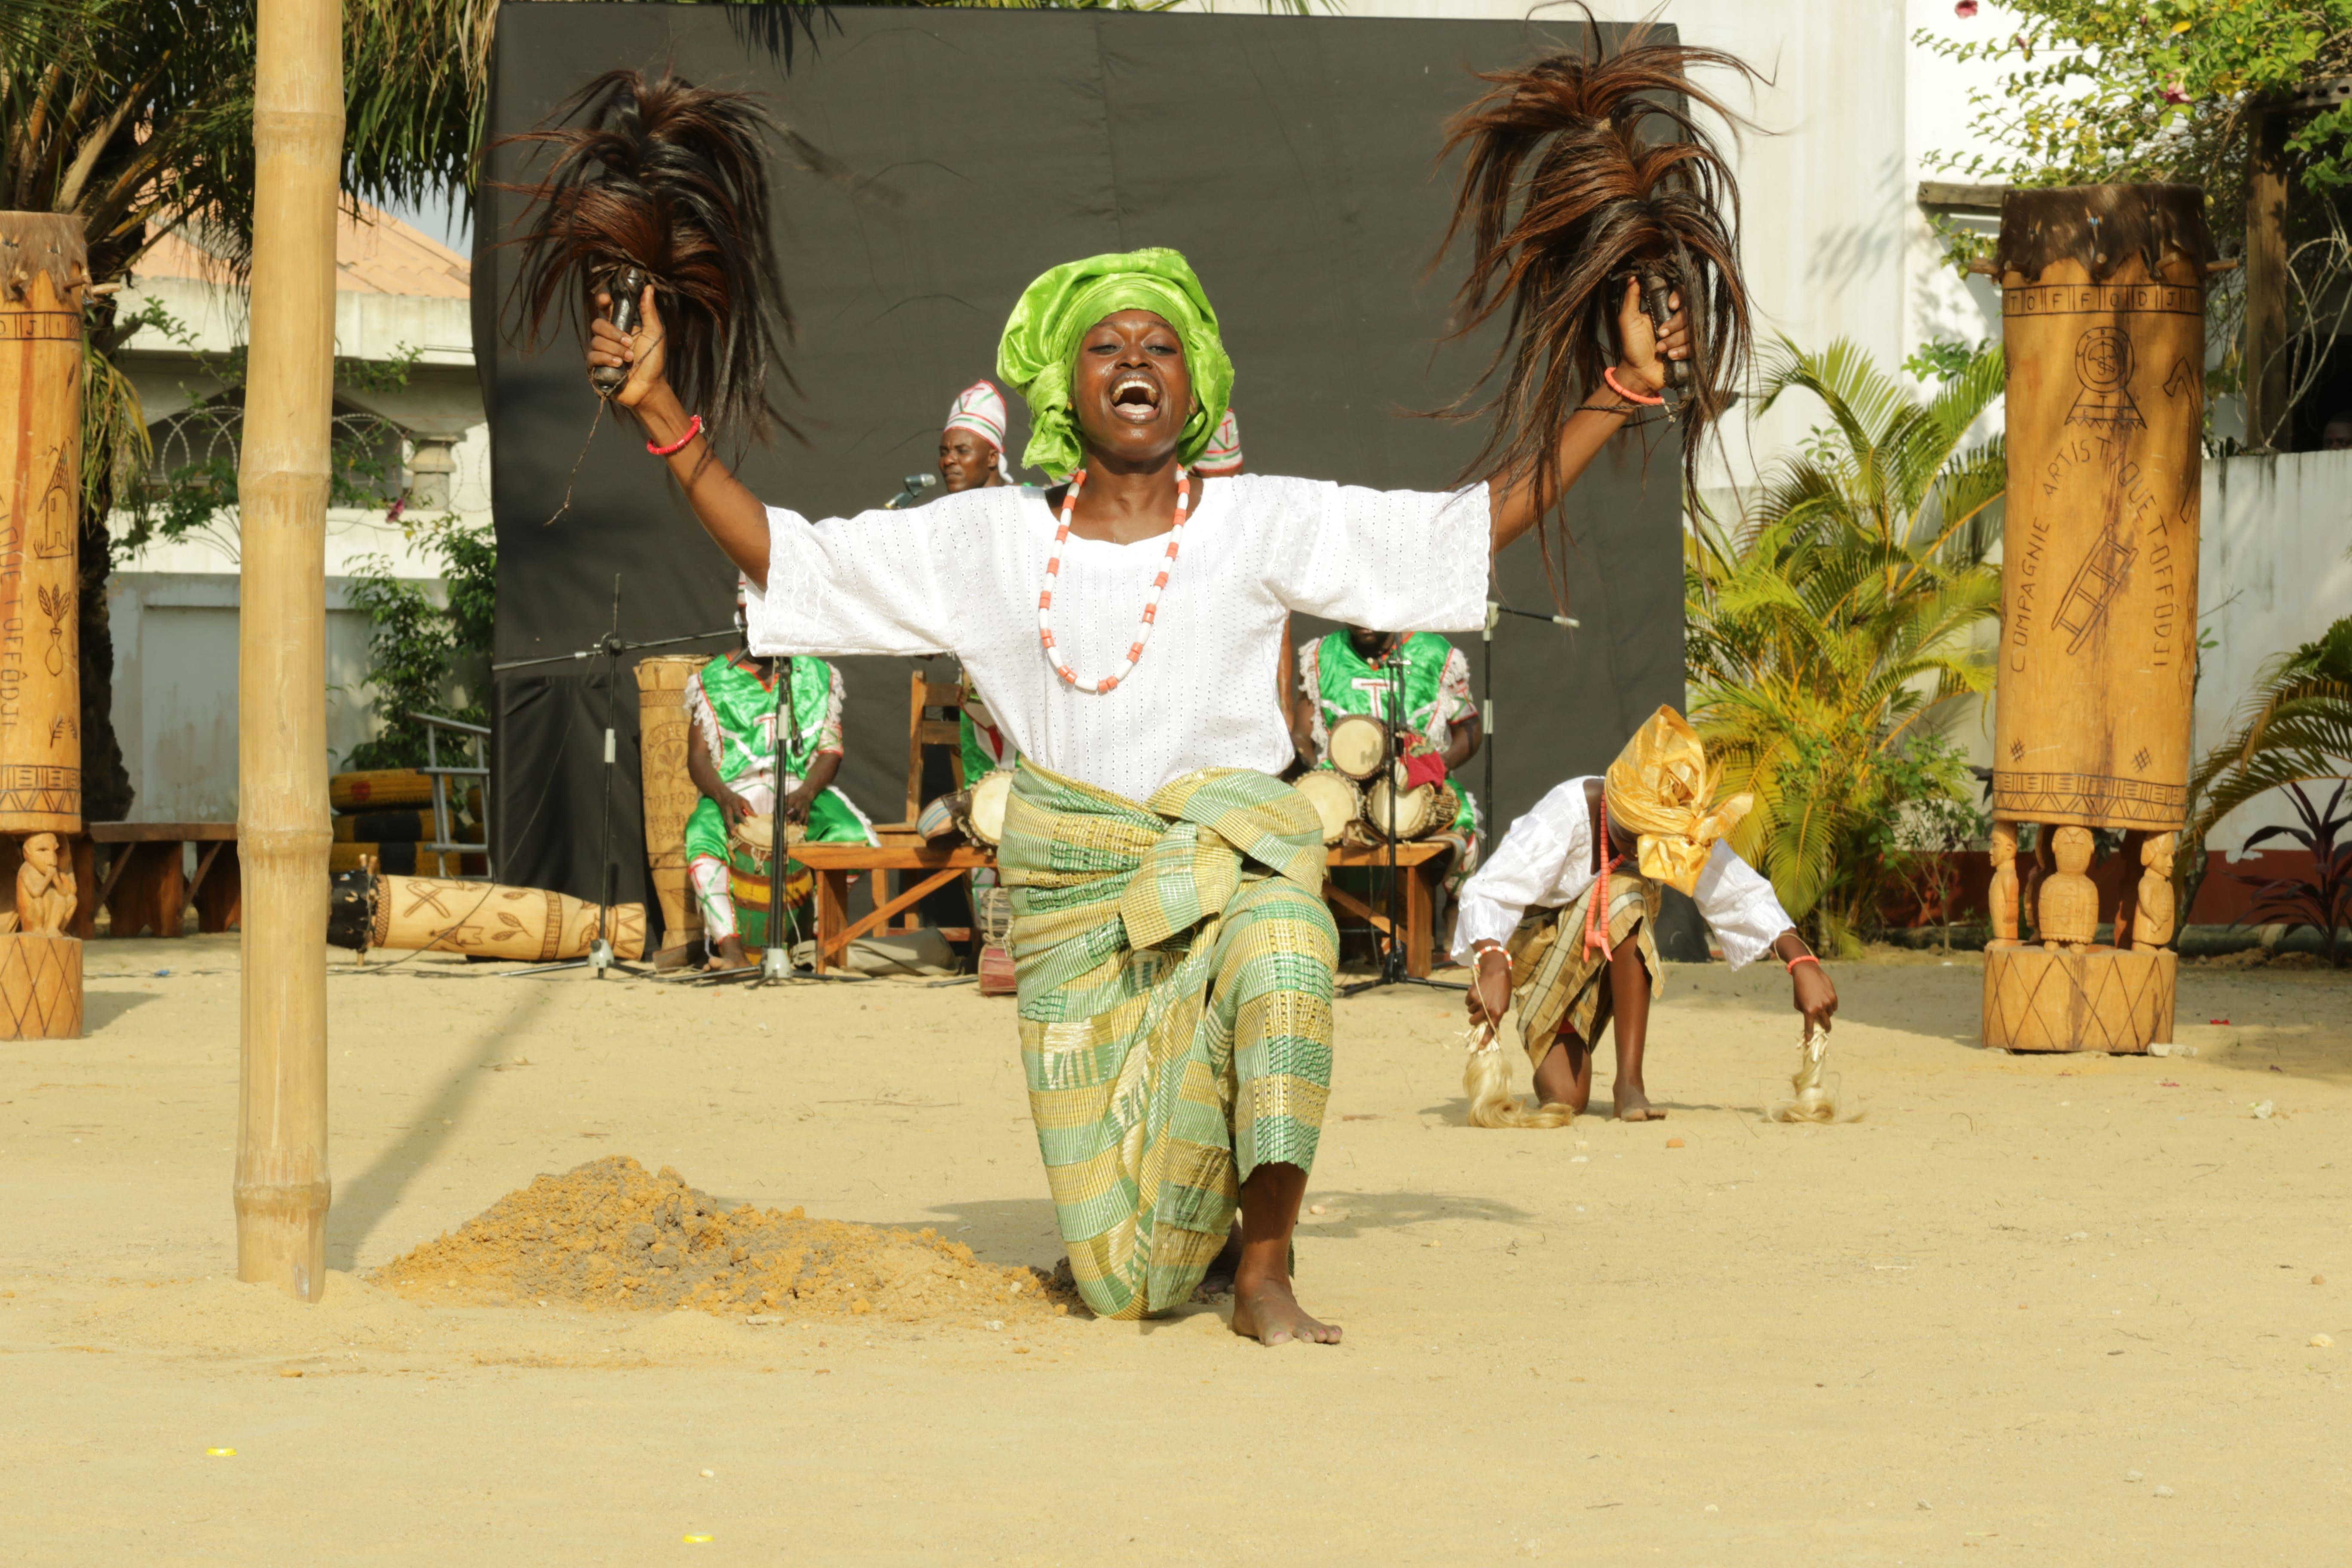 Danse traditionnelle avec la Compagnie artistique Toffodji #3